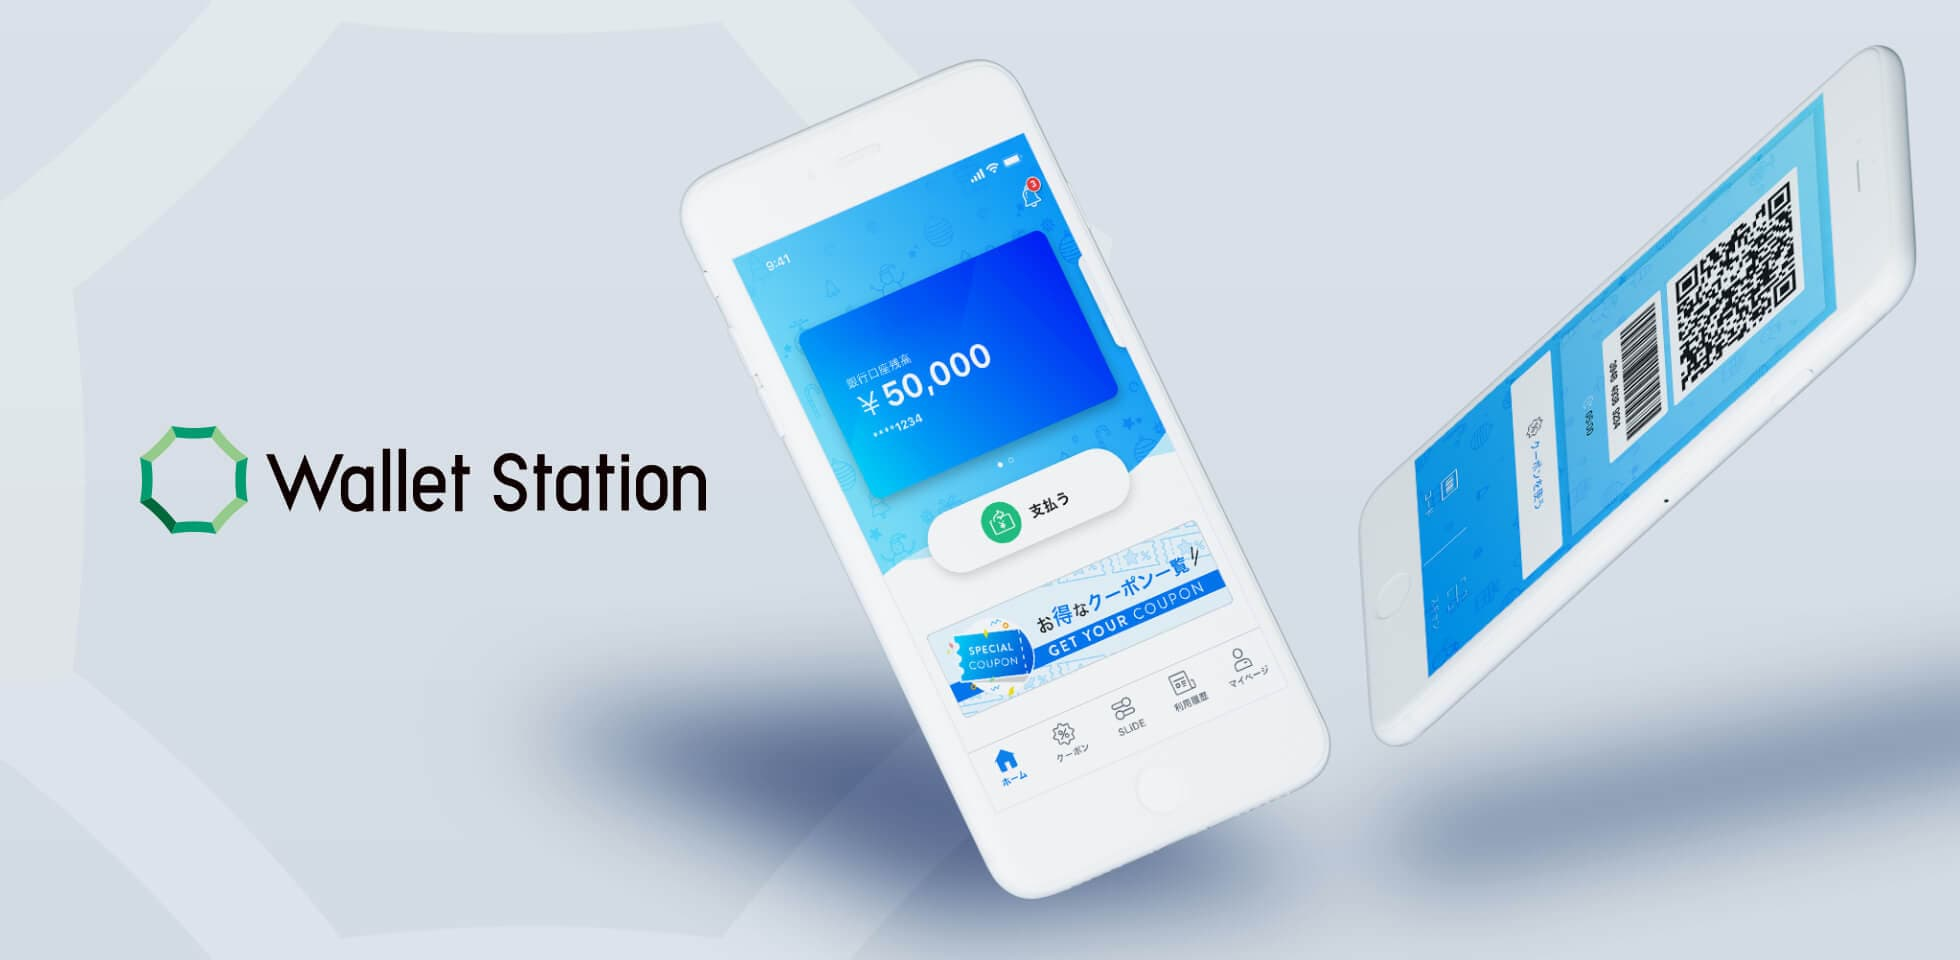 Wallet Station